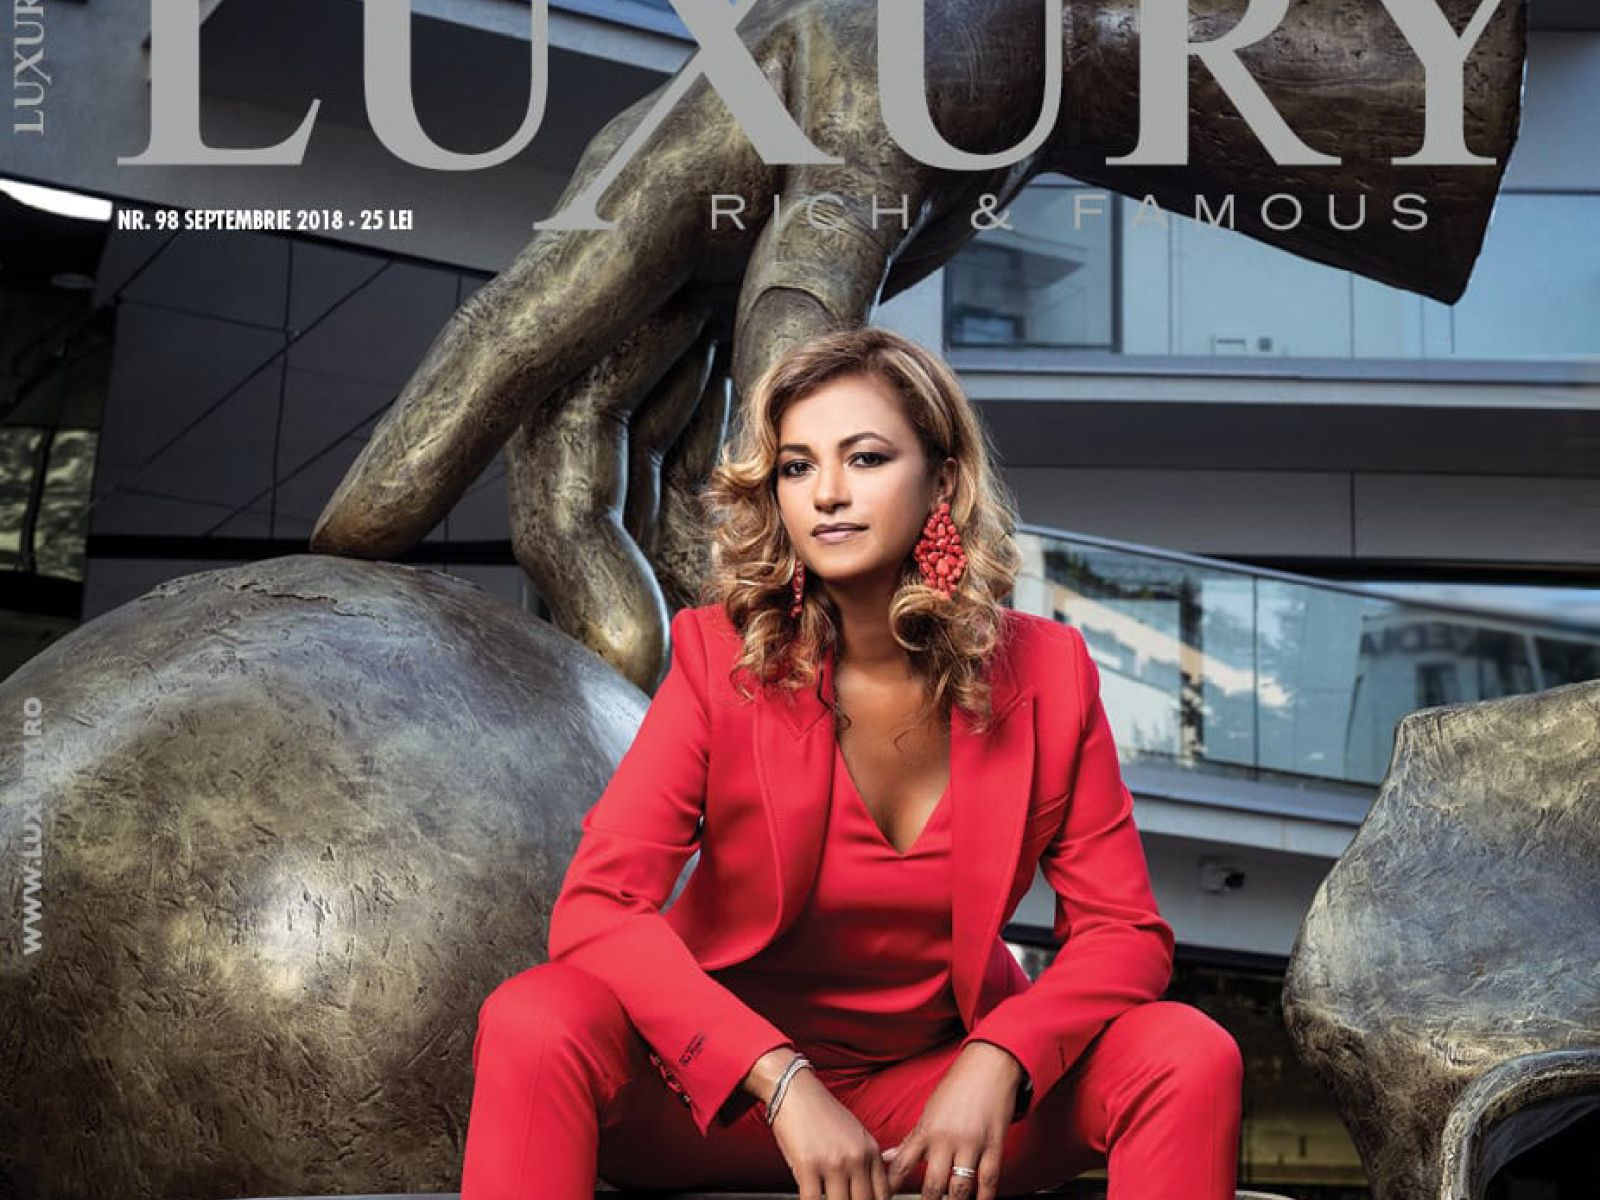 Beatrice Dumitrașcu, on the cover of Luxury Magazine